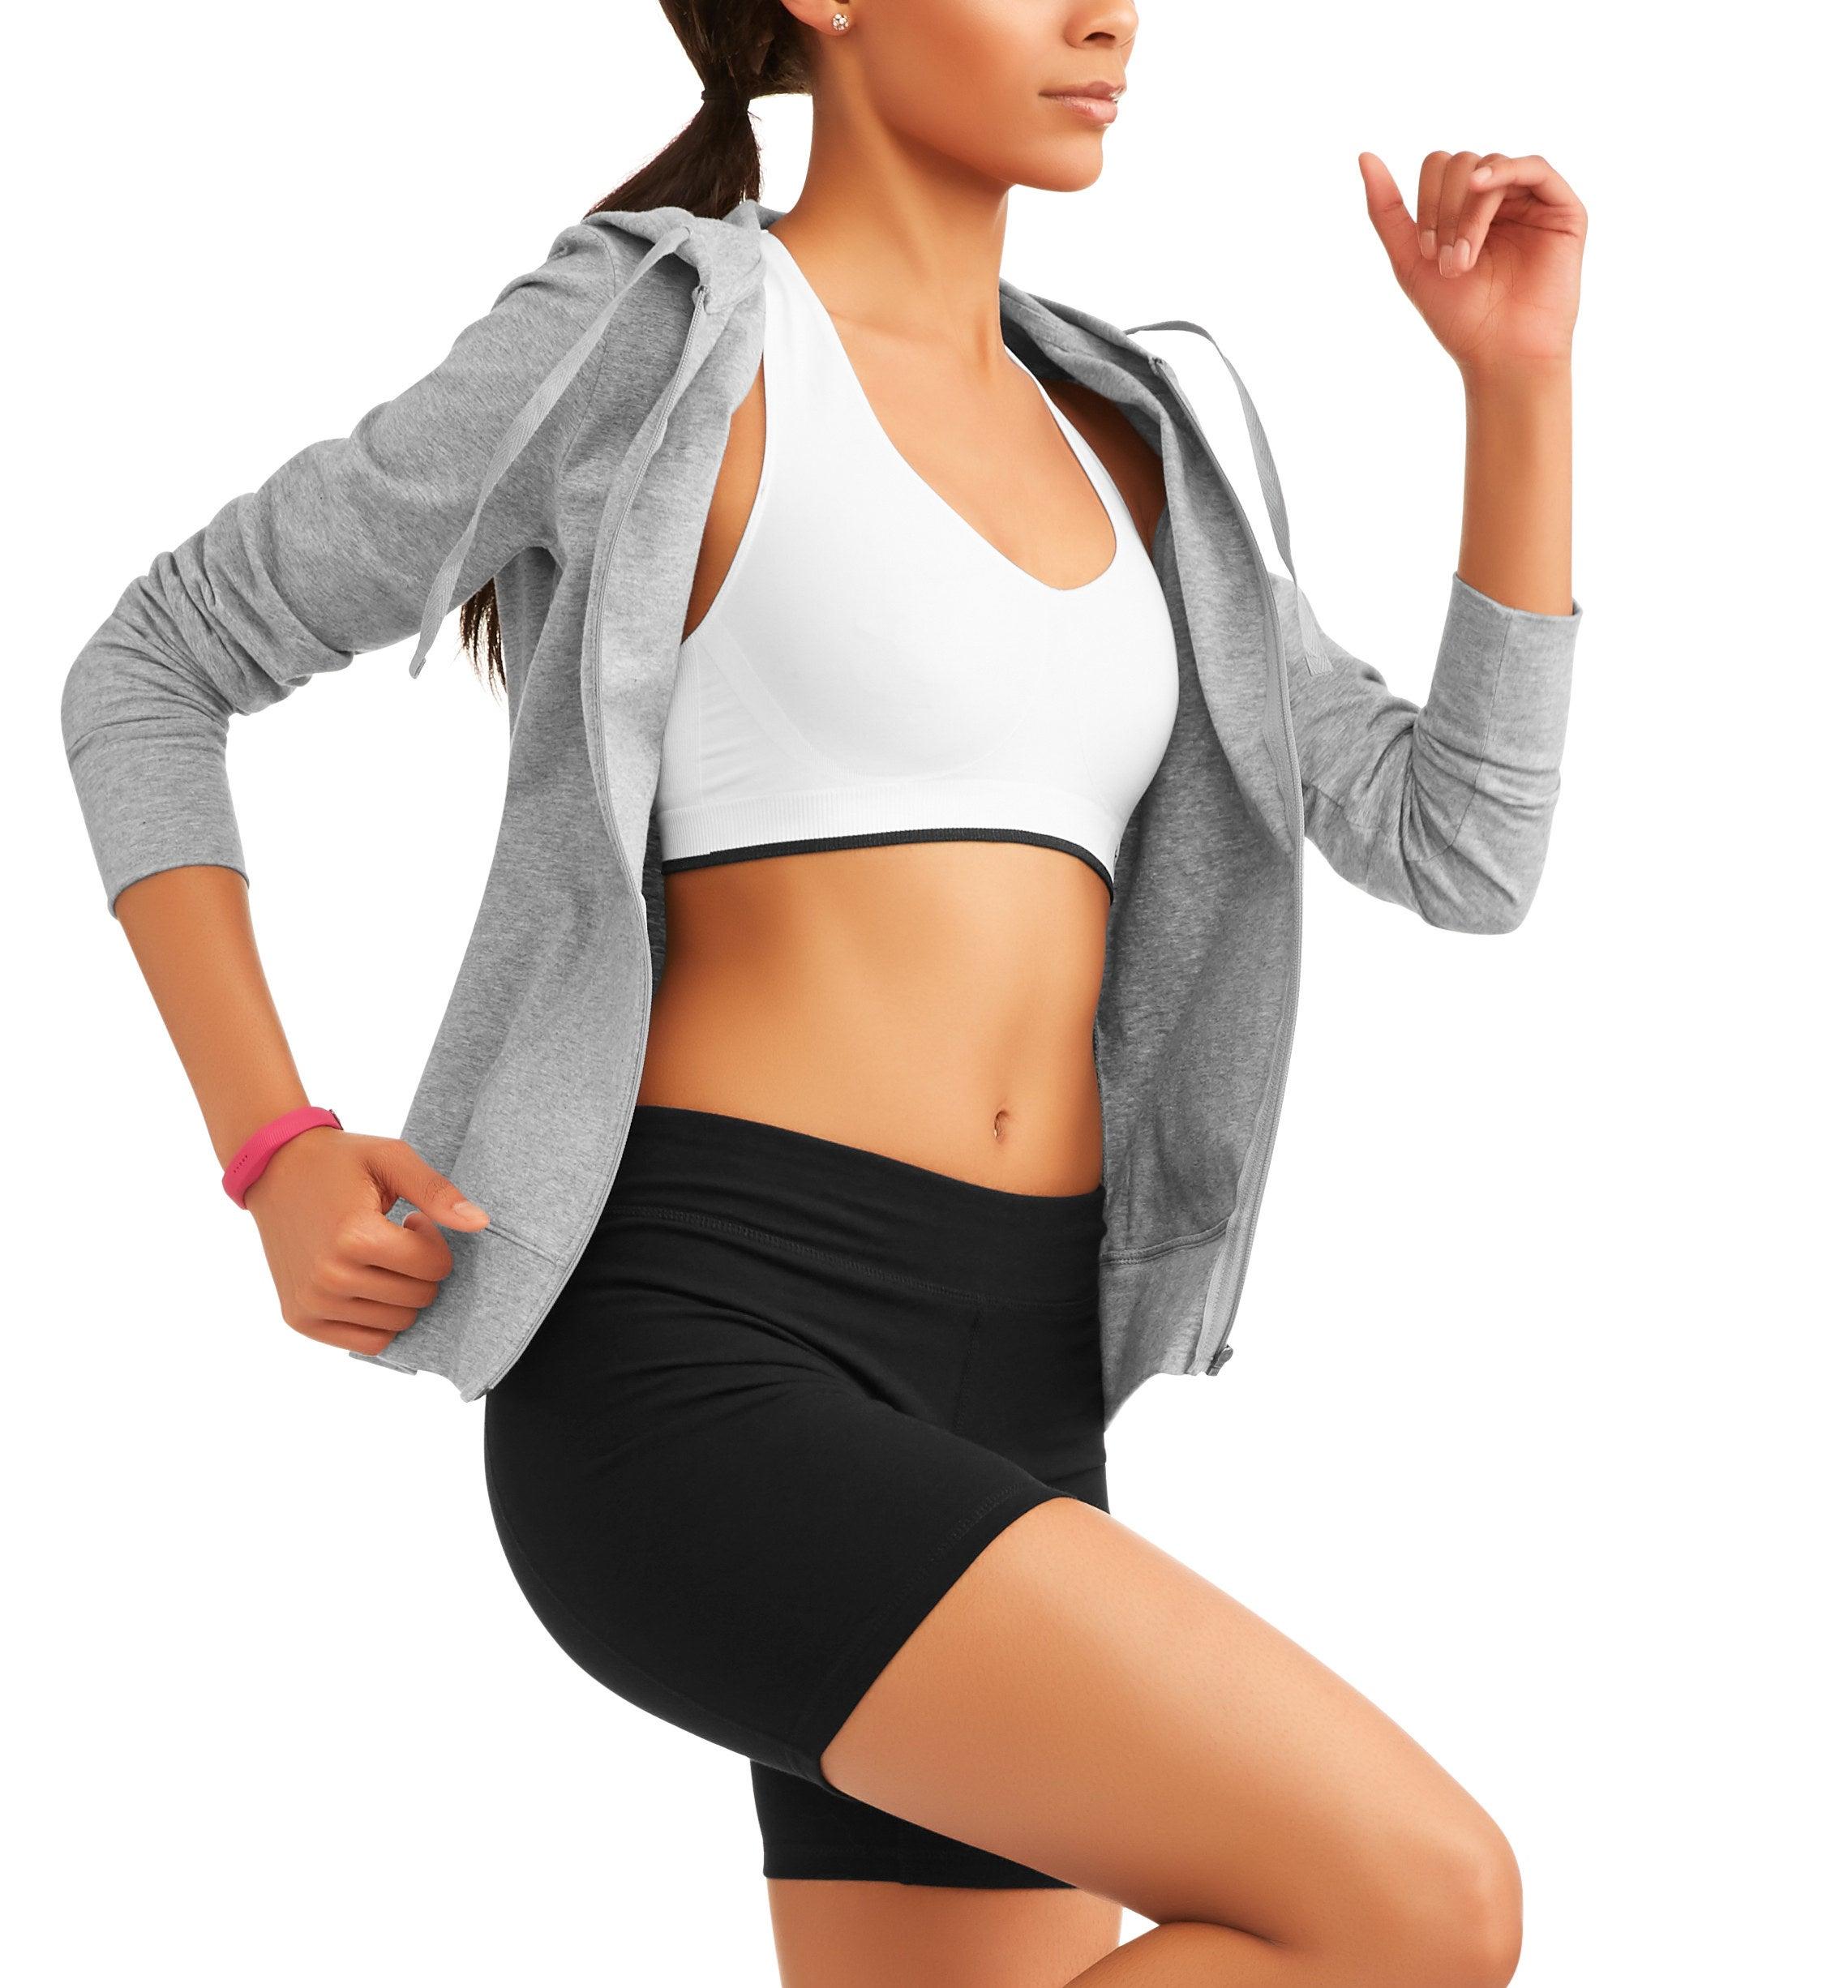 Model wearing the shorts in black